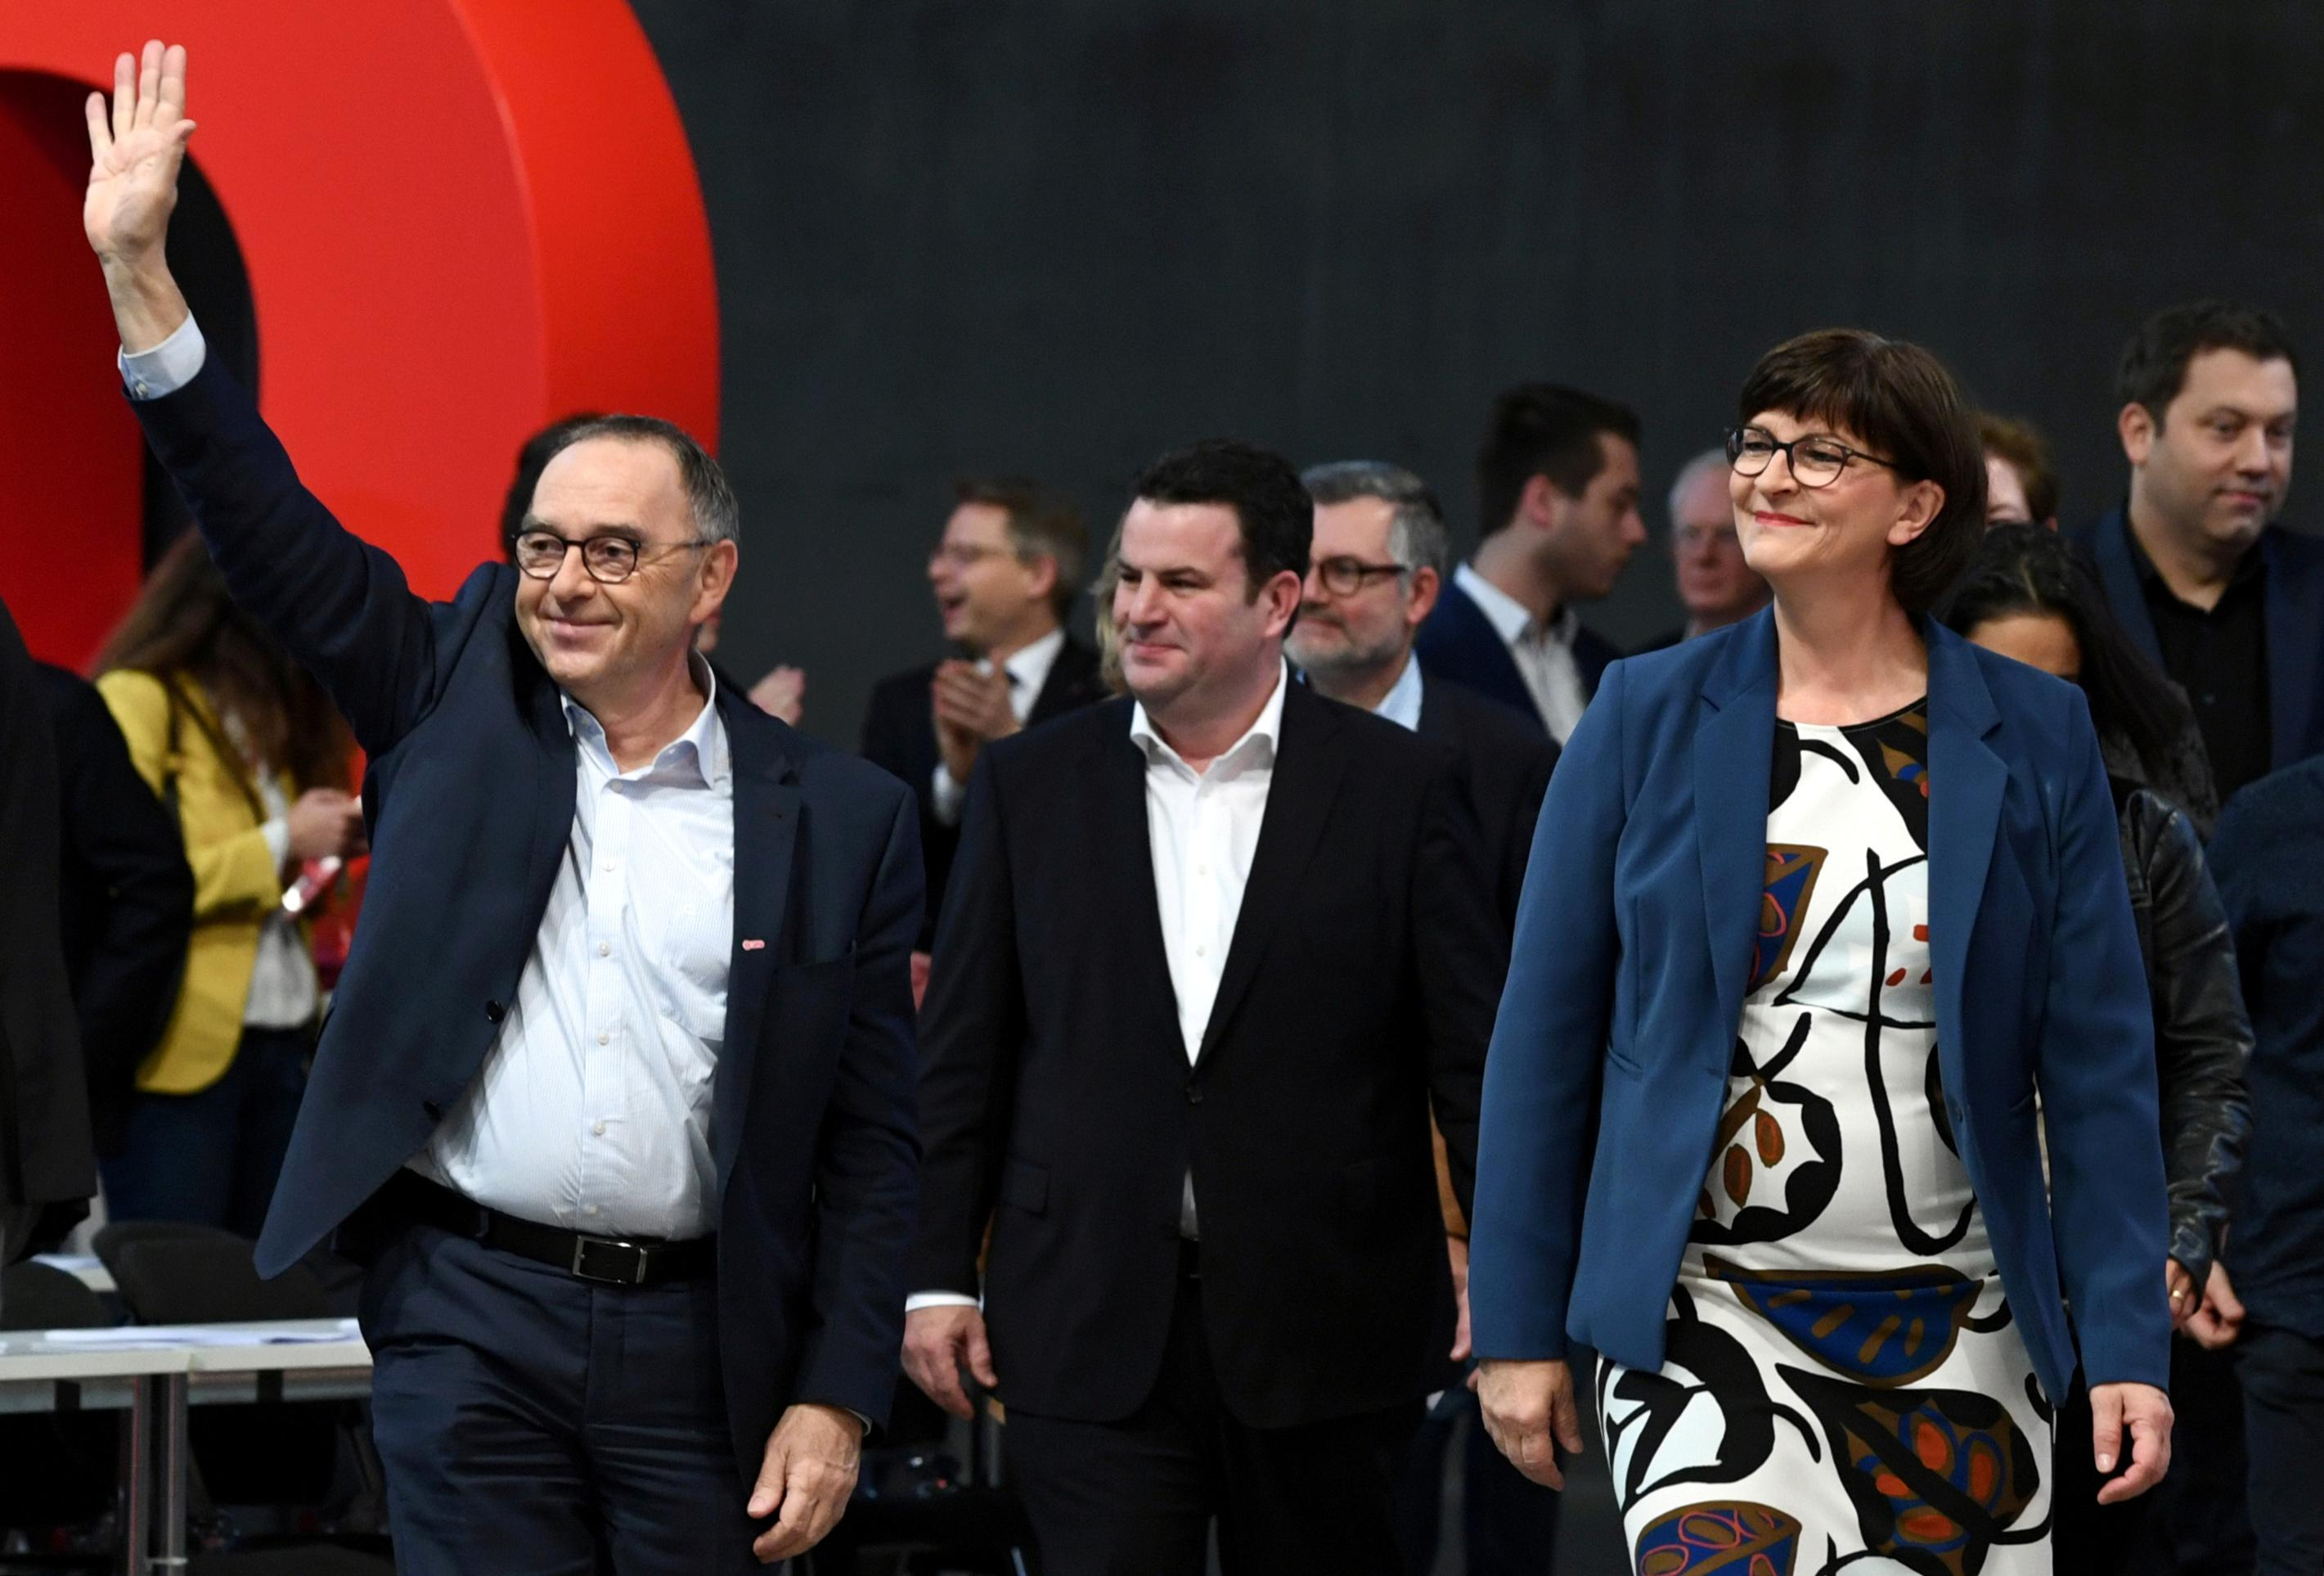 Germany's SPD slip in polls after choosing new leftist leaders